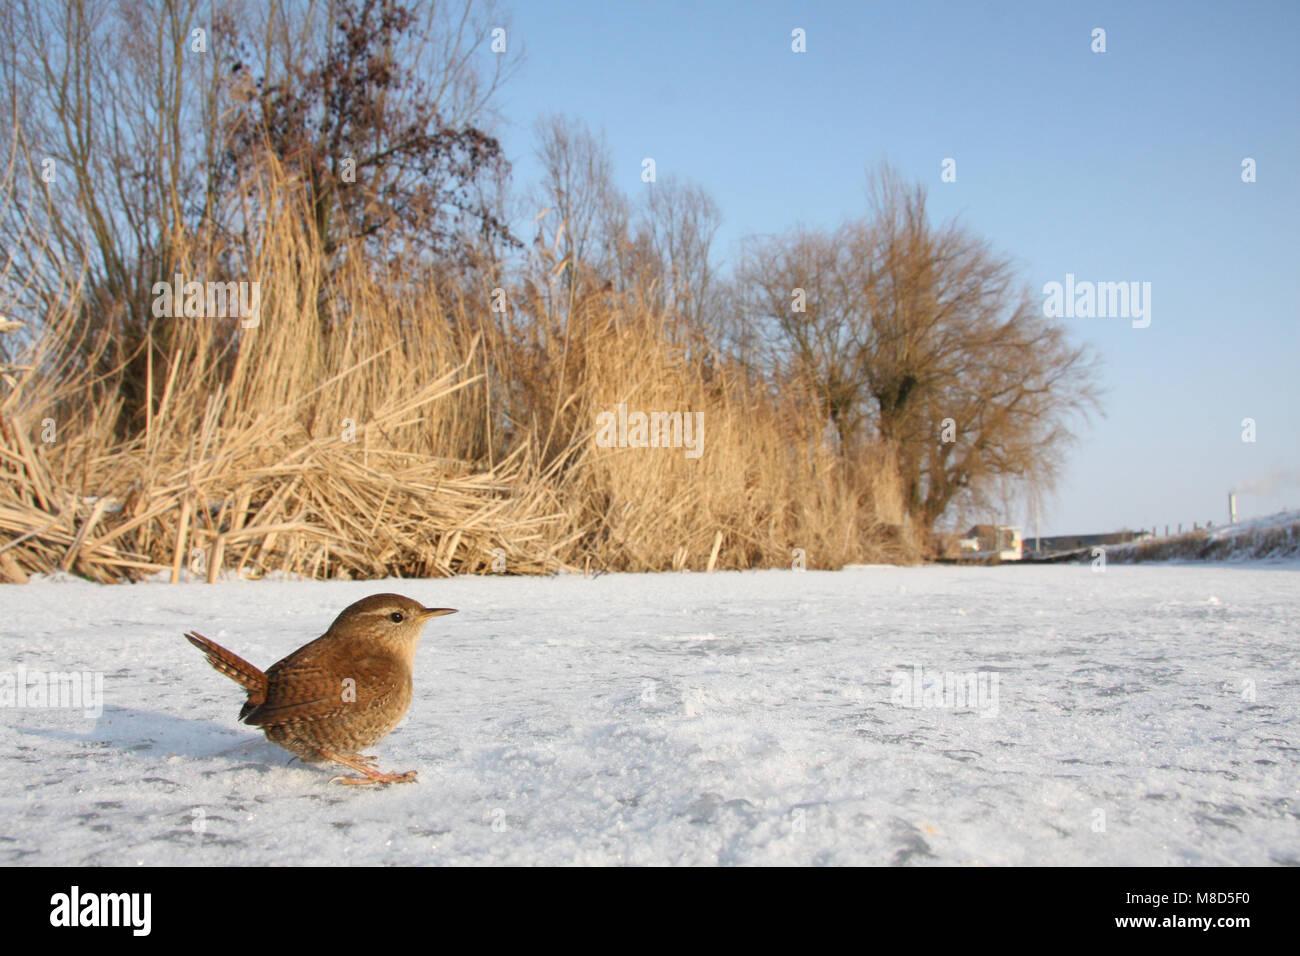 Winterkoning zittend in sneeuw; Winter Wren perched in snow - Stock Image